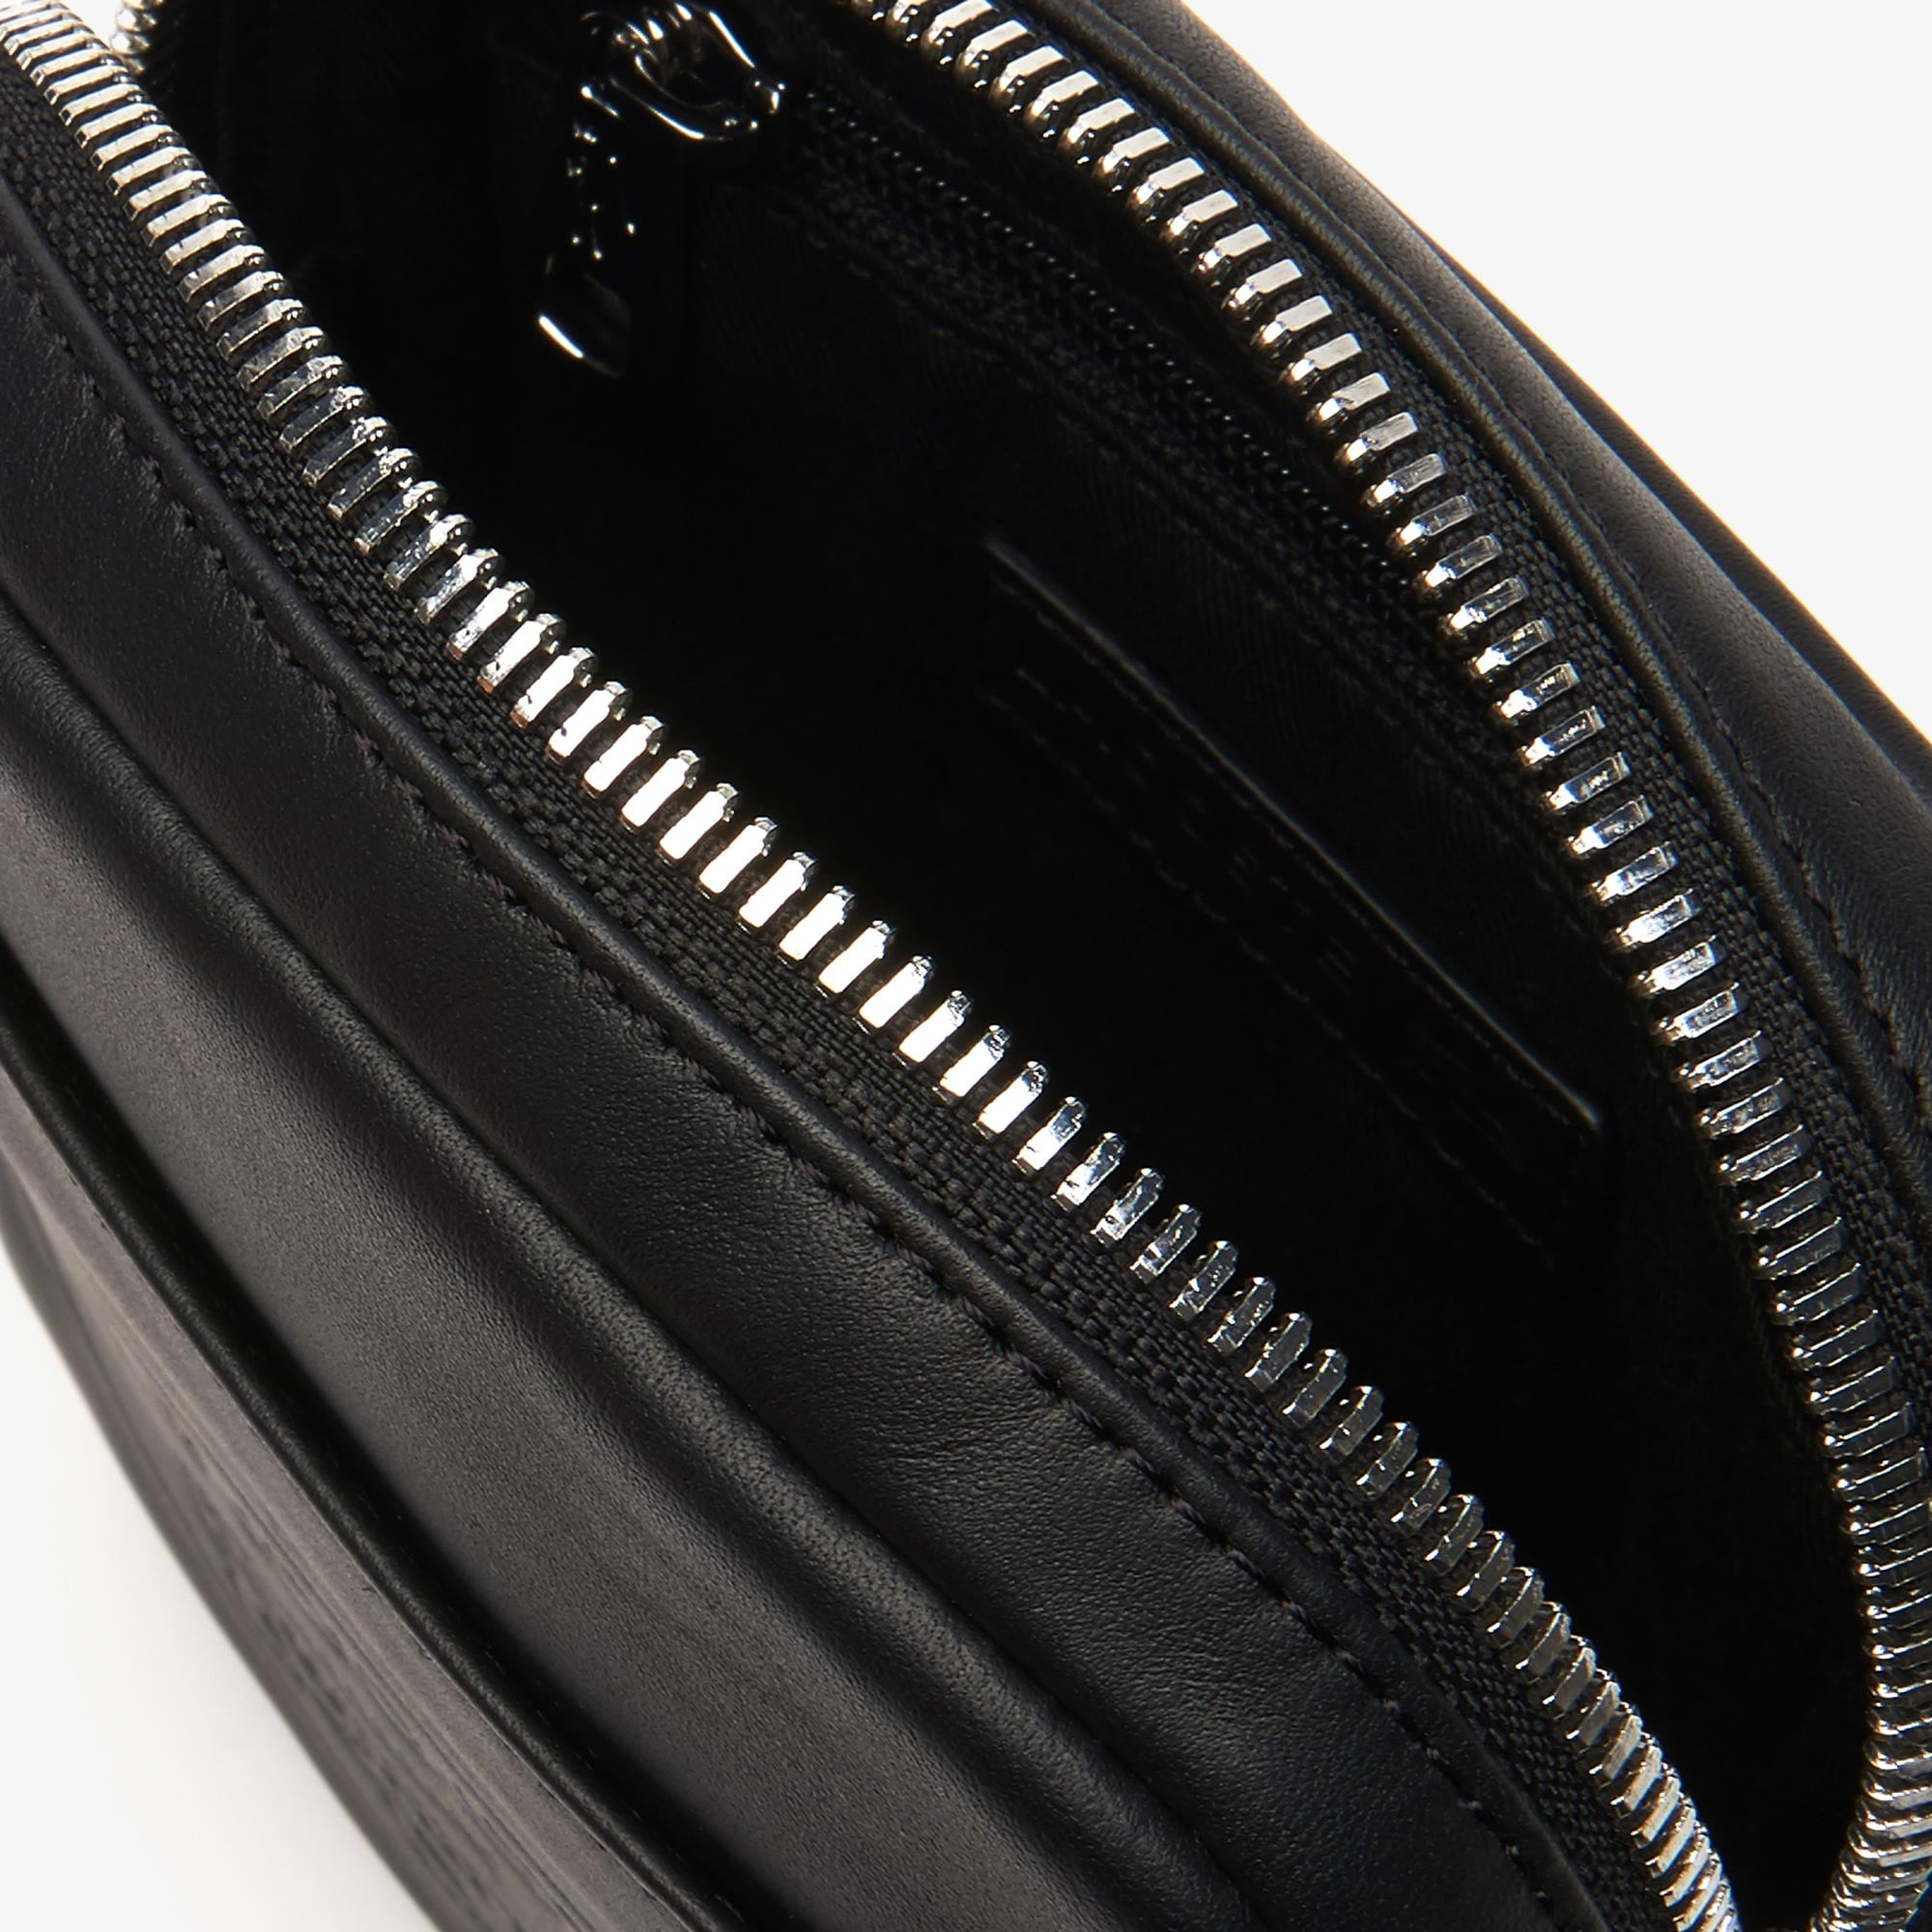 89c020b8bd Men'S L.12.12 Casual Embossed Lettering Vertical Leather Bag in Black